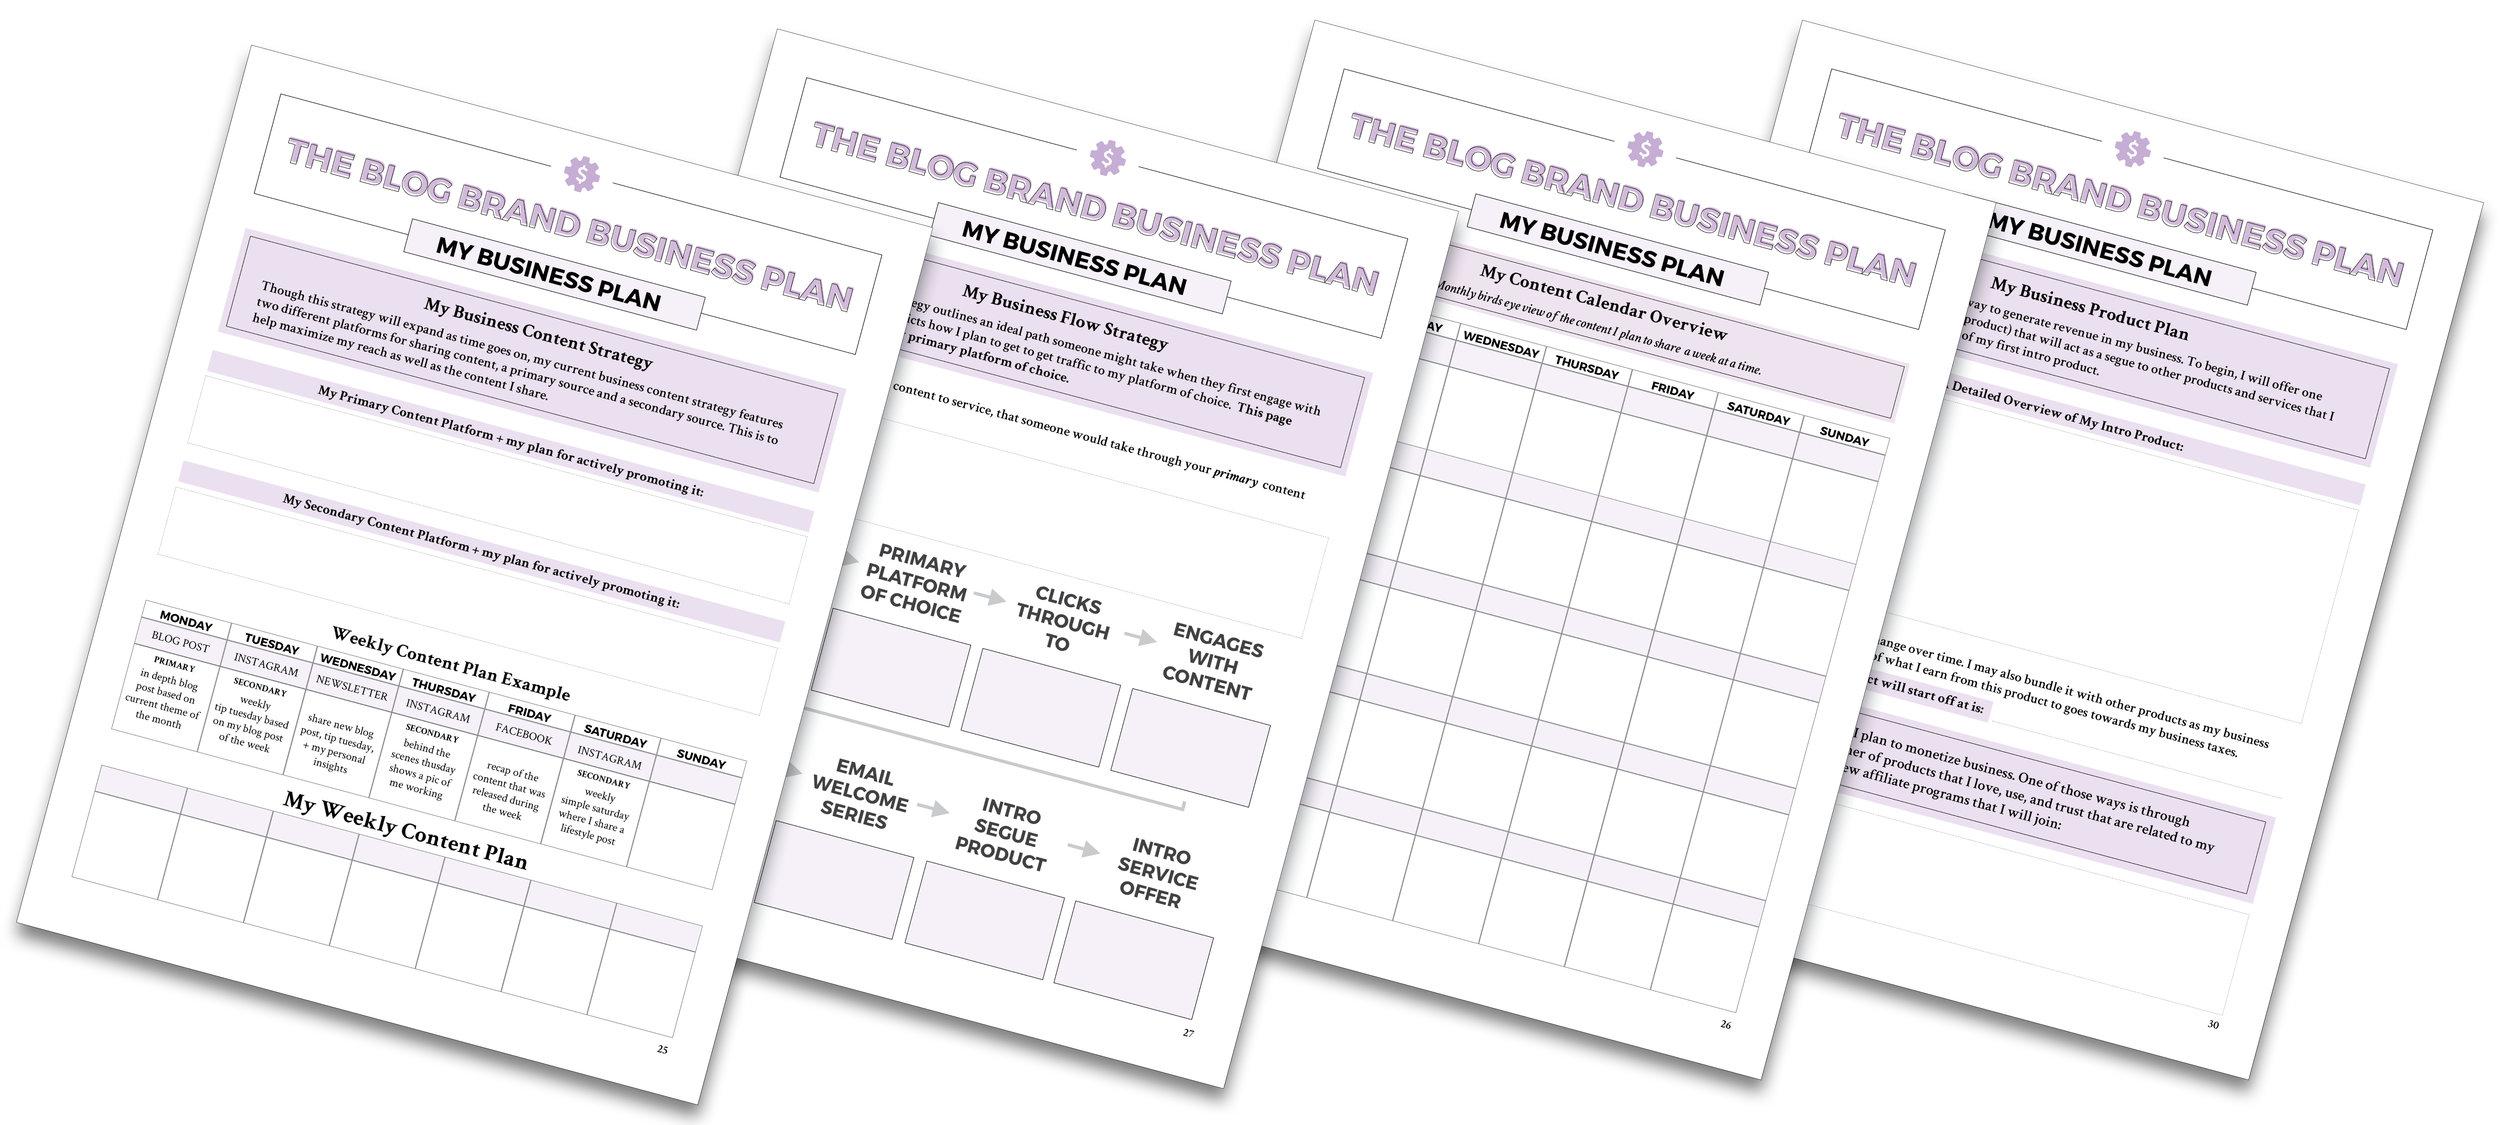 The Blog Brand Business Plan | by Yuri Gibson of viaYuri.com